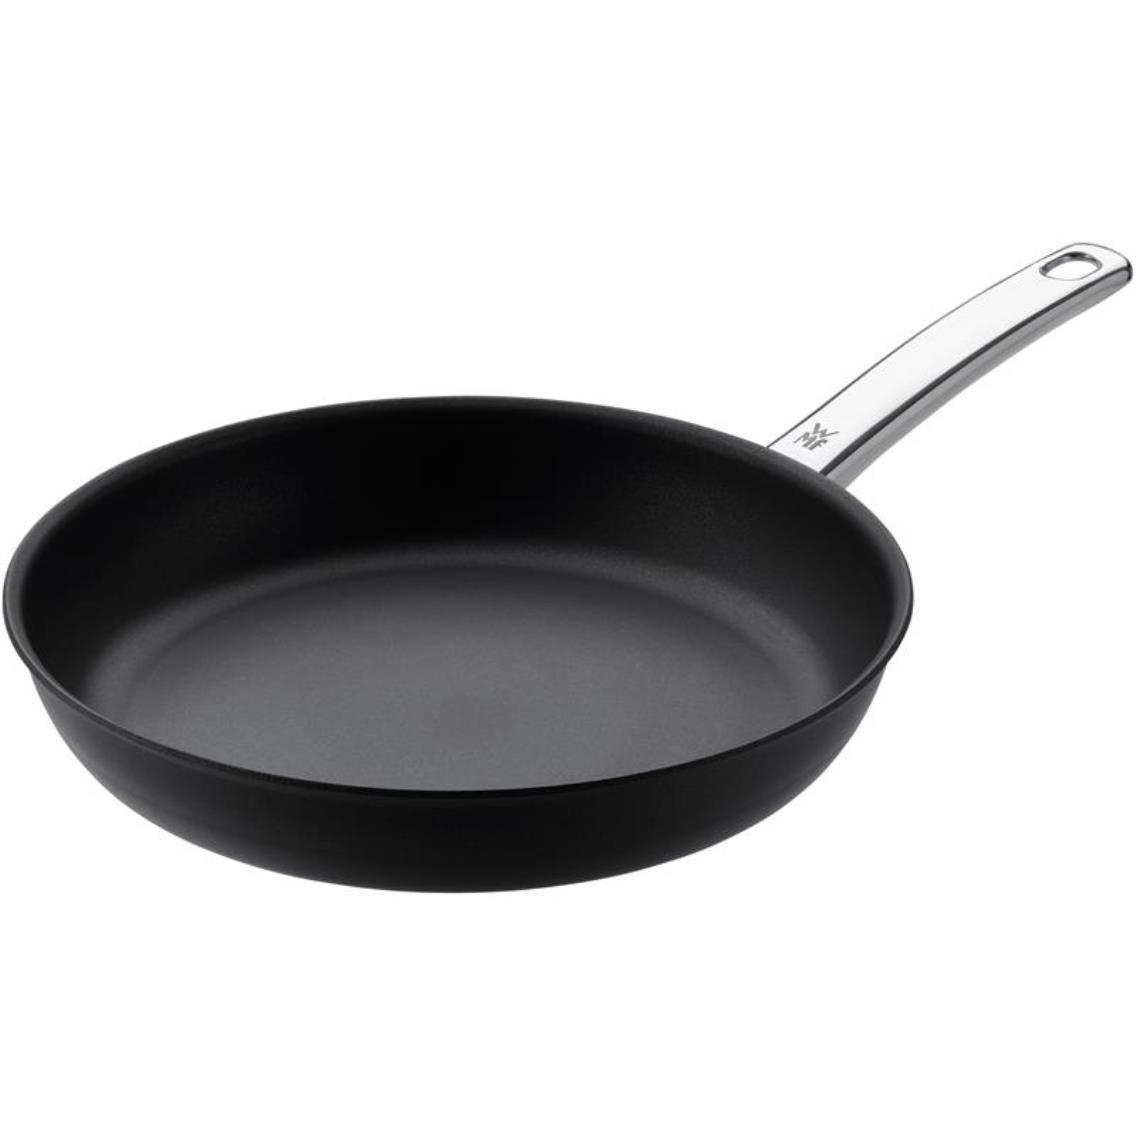 Онлайн каталог PROMENU: Сковородка индукционная WMF STEAK PROFI, диаметр 28 см, черный                                   17 7128 6021